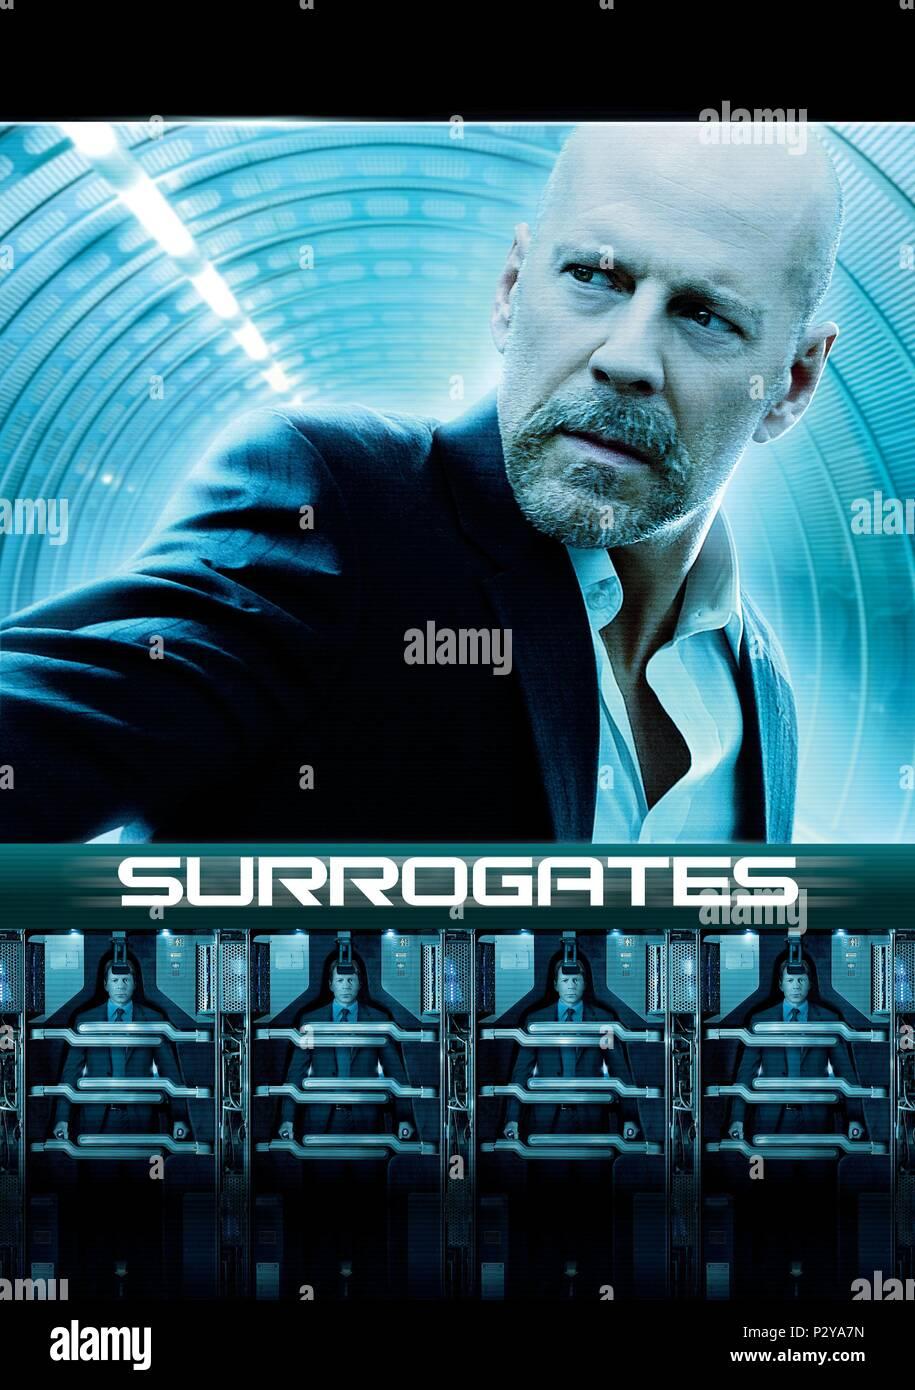 Original Film Title: SURROGATES.  English Title: SURROGATES.  Film Director: JONATHAN MOSTOW.  Year: 2009. Credit: TOUCHSTONE PICTURES / Album Stock Photo